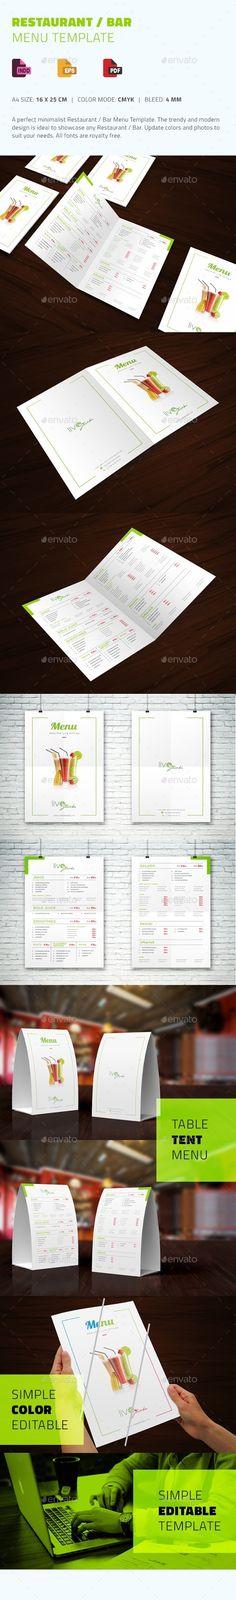 Fachada CMYK CMYK Bar  Restaurant Pinterest - bar menu template